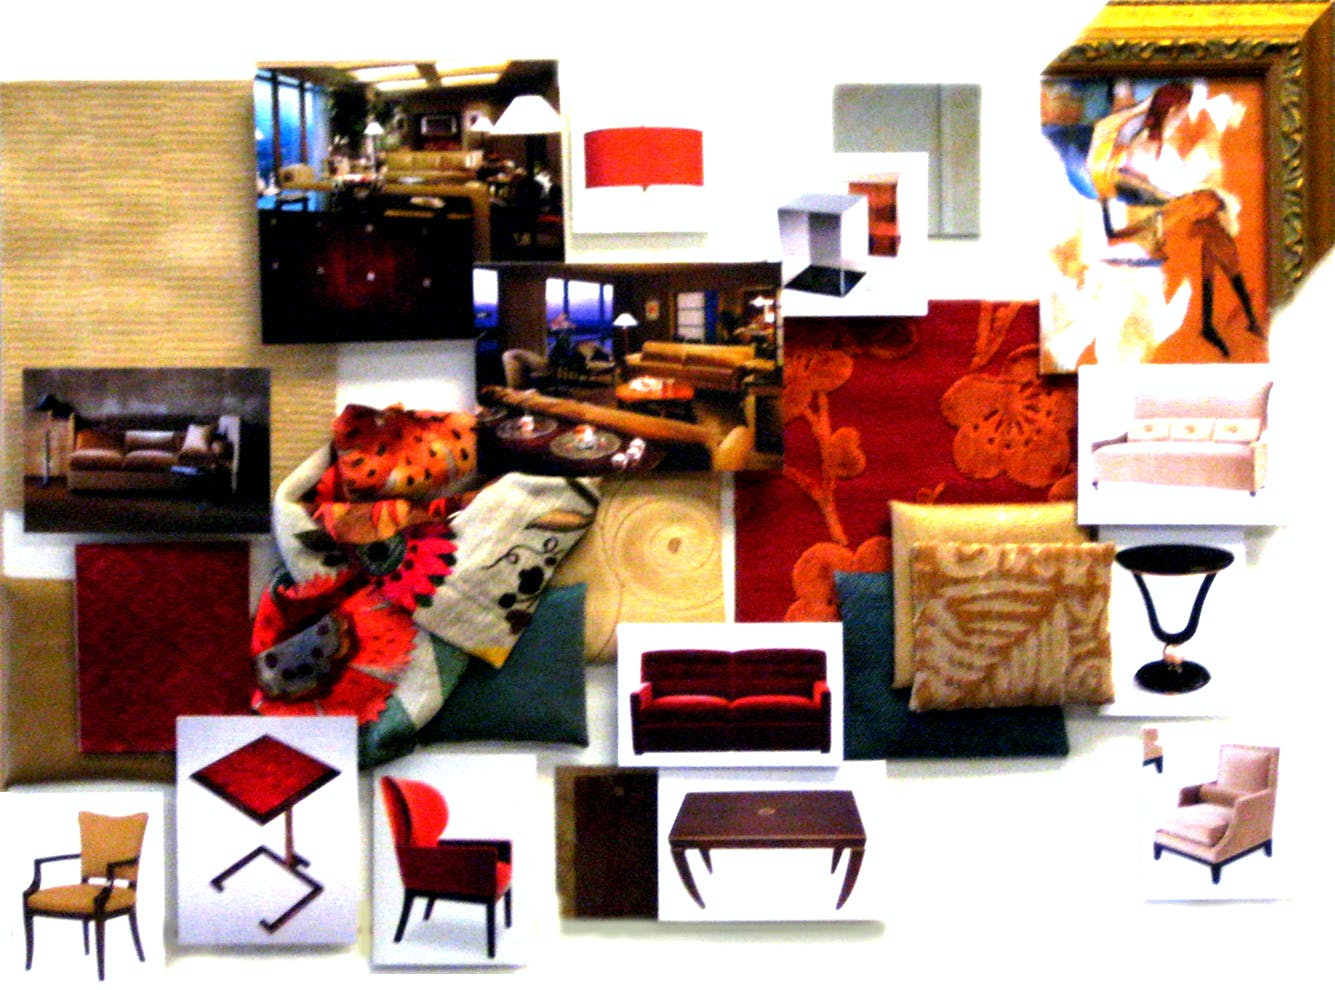 Executive Lounge 2 FFE